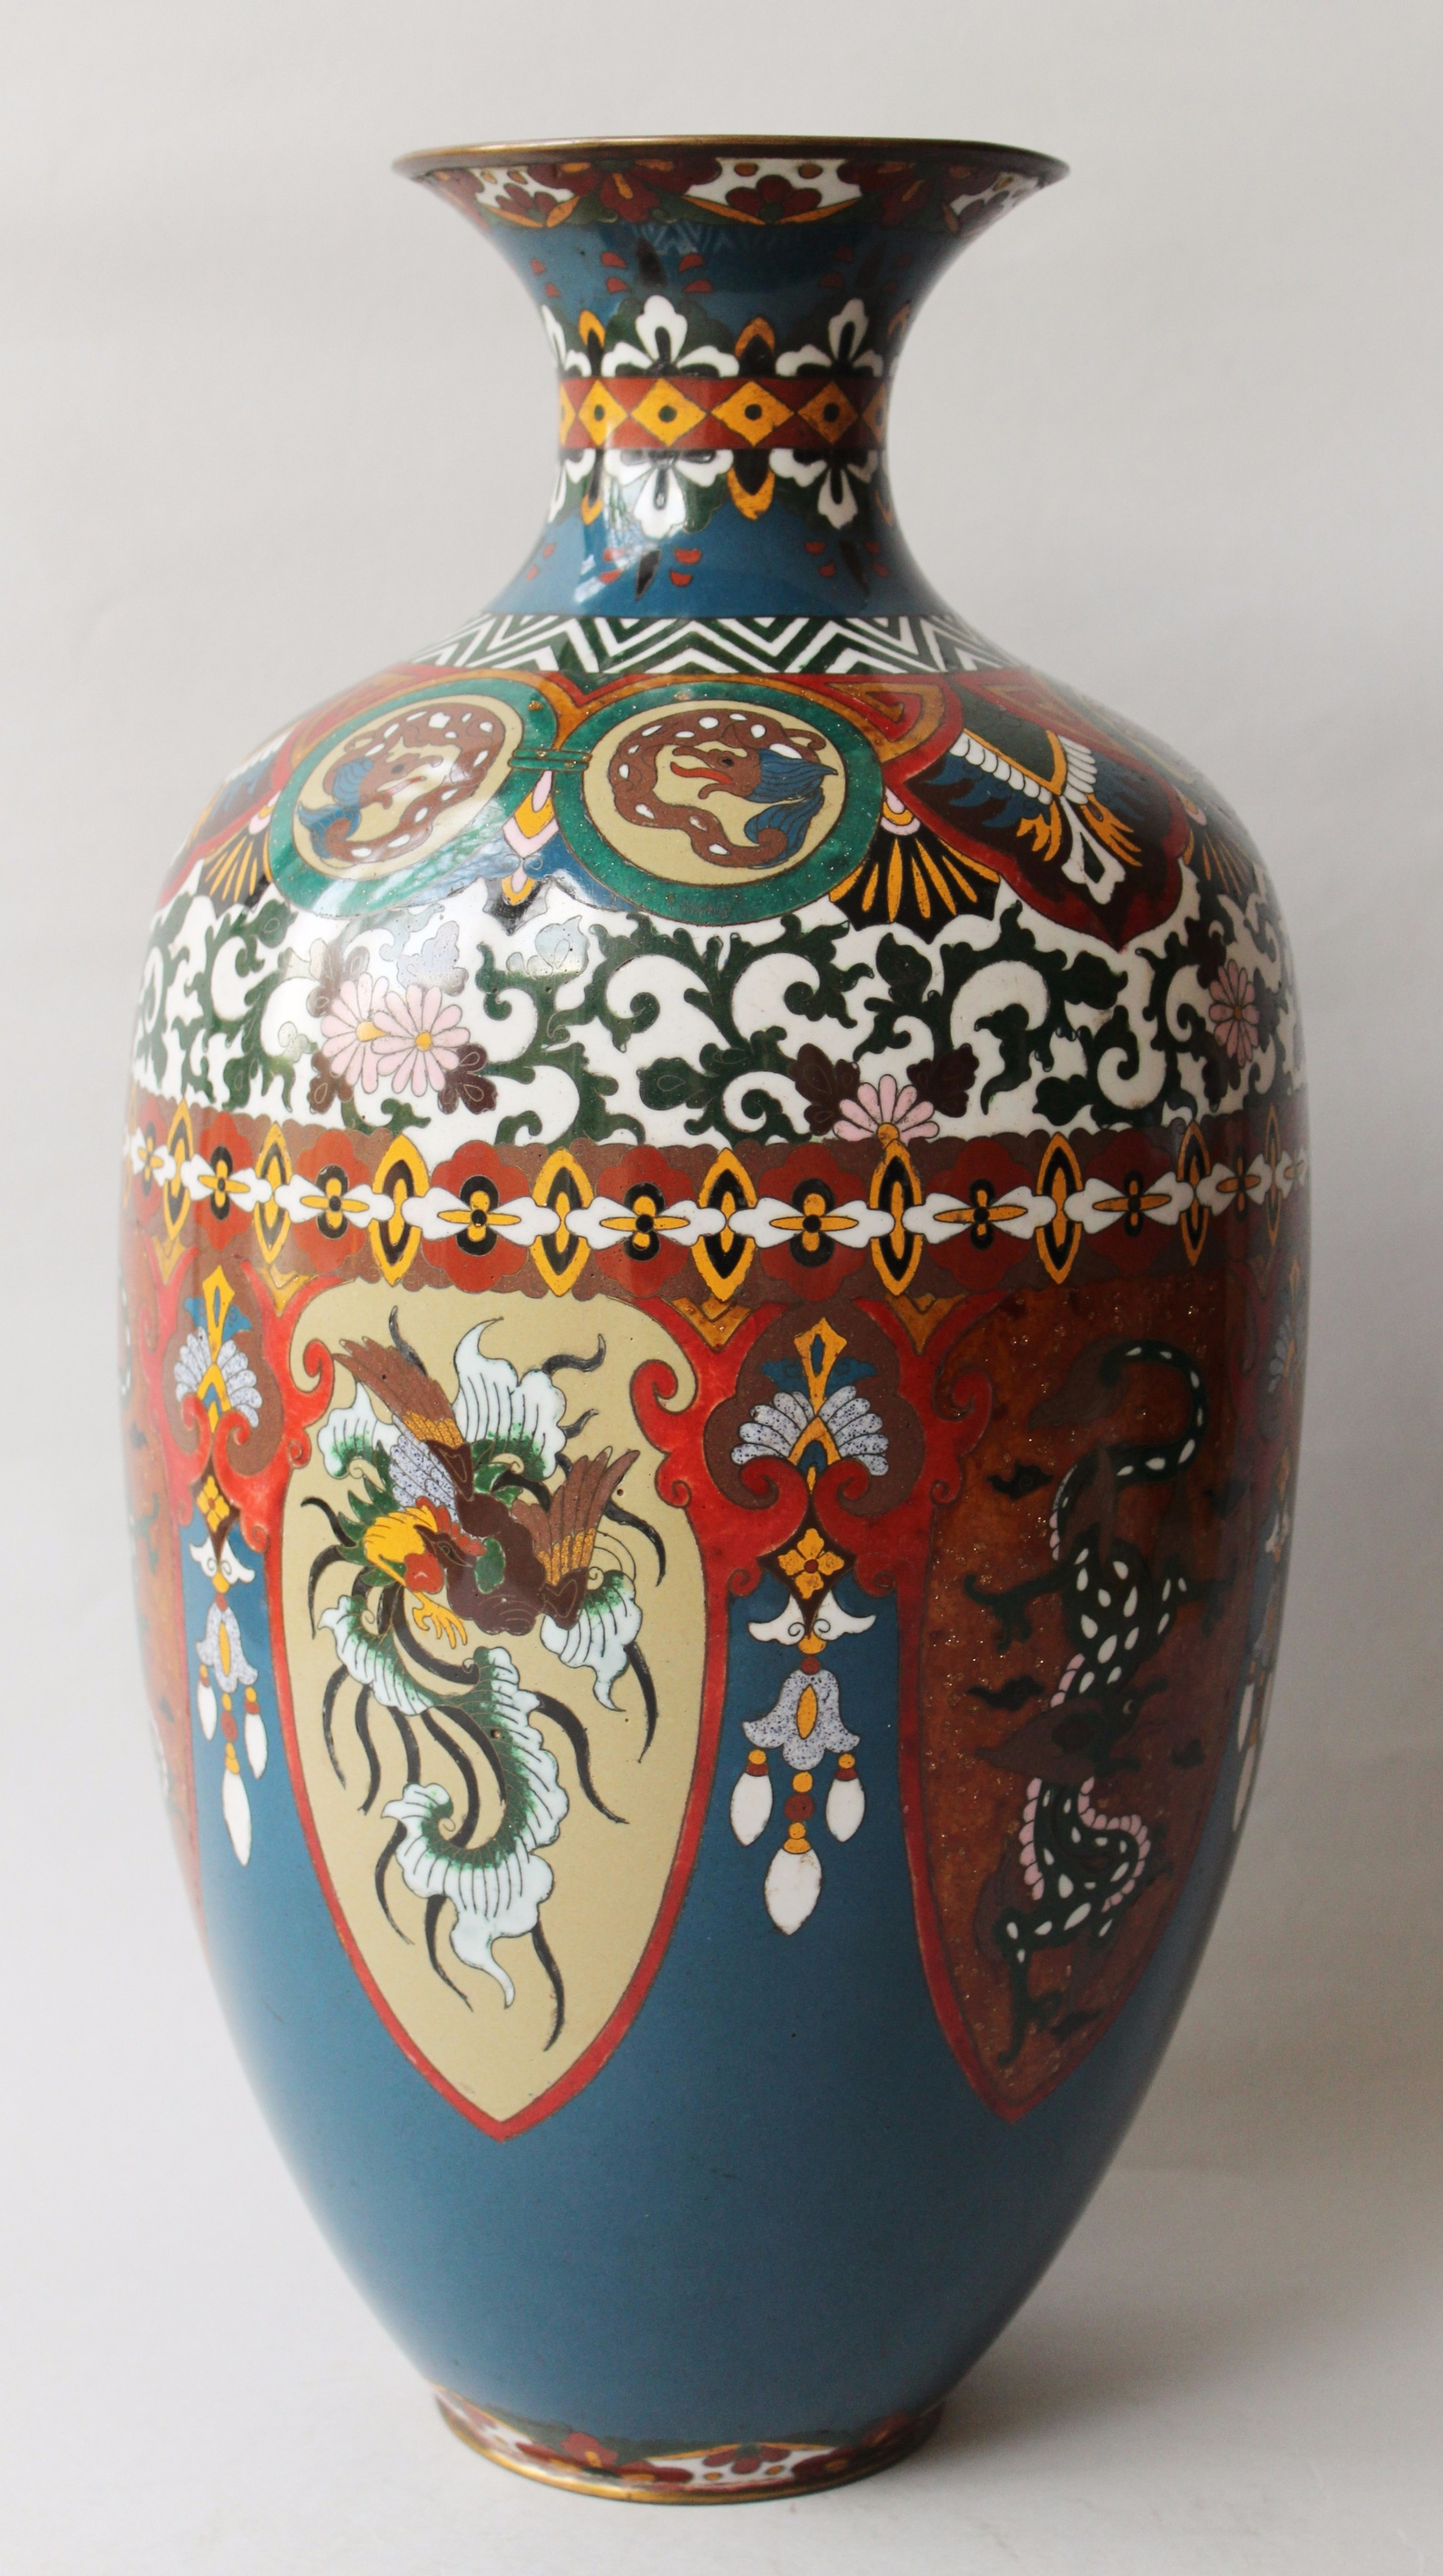 Very large antique japanese cloisonne vase dragon and phoenix very large antique japanese cloisonne vase dragon and phoenix reviewsmspy